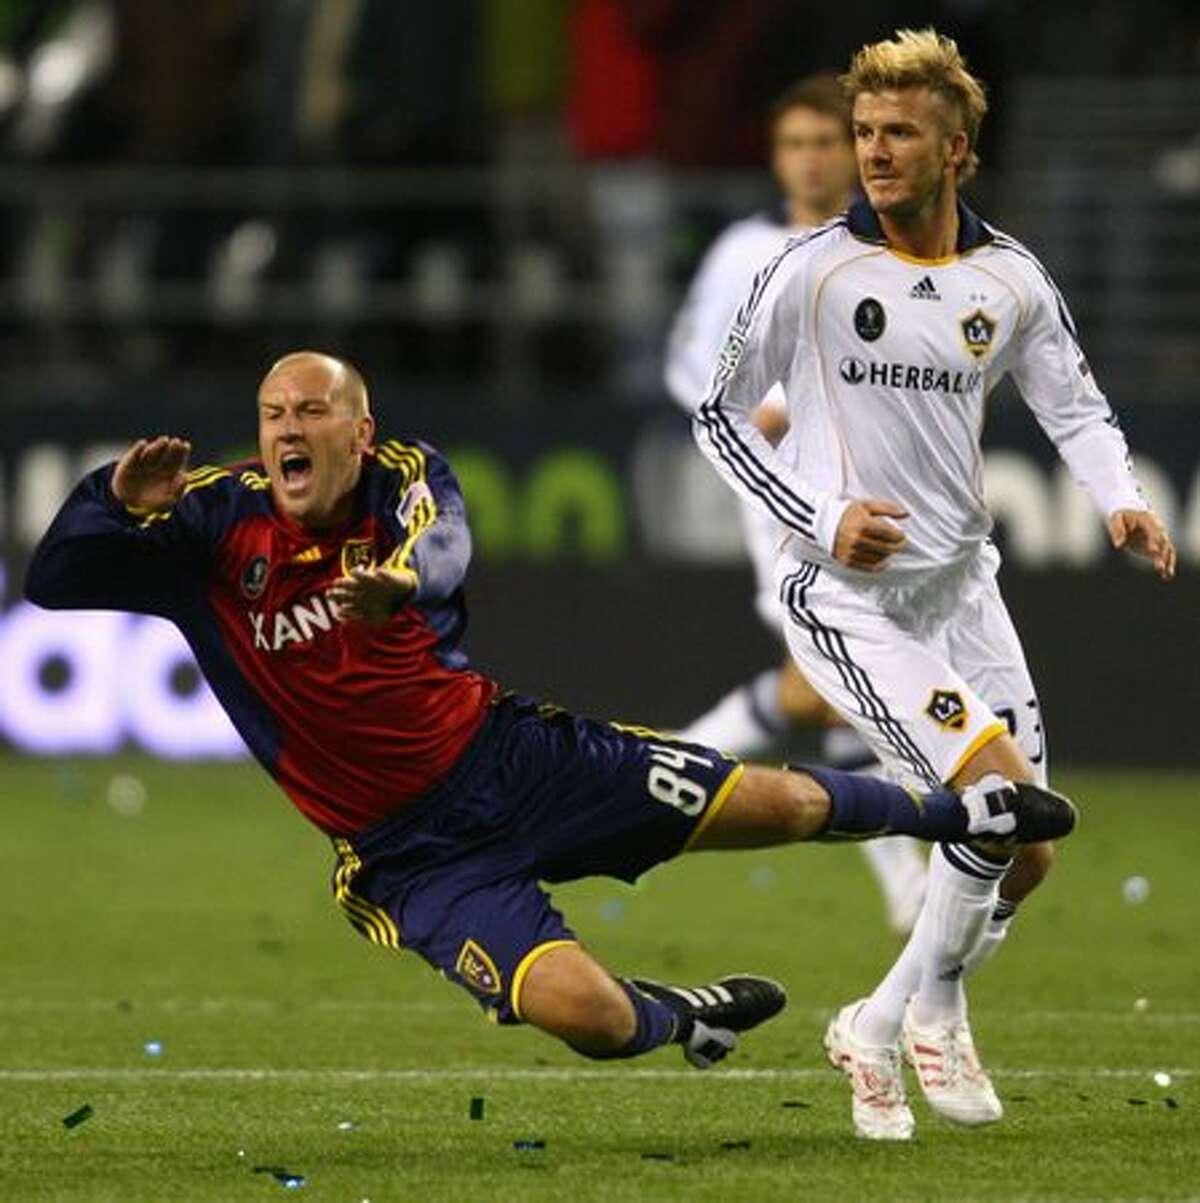 Real Salt Lake player Clint Mathis falls over LA Galaxy player David Beckham.